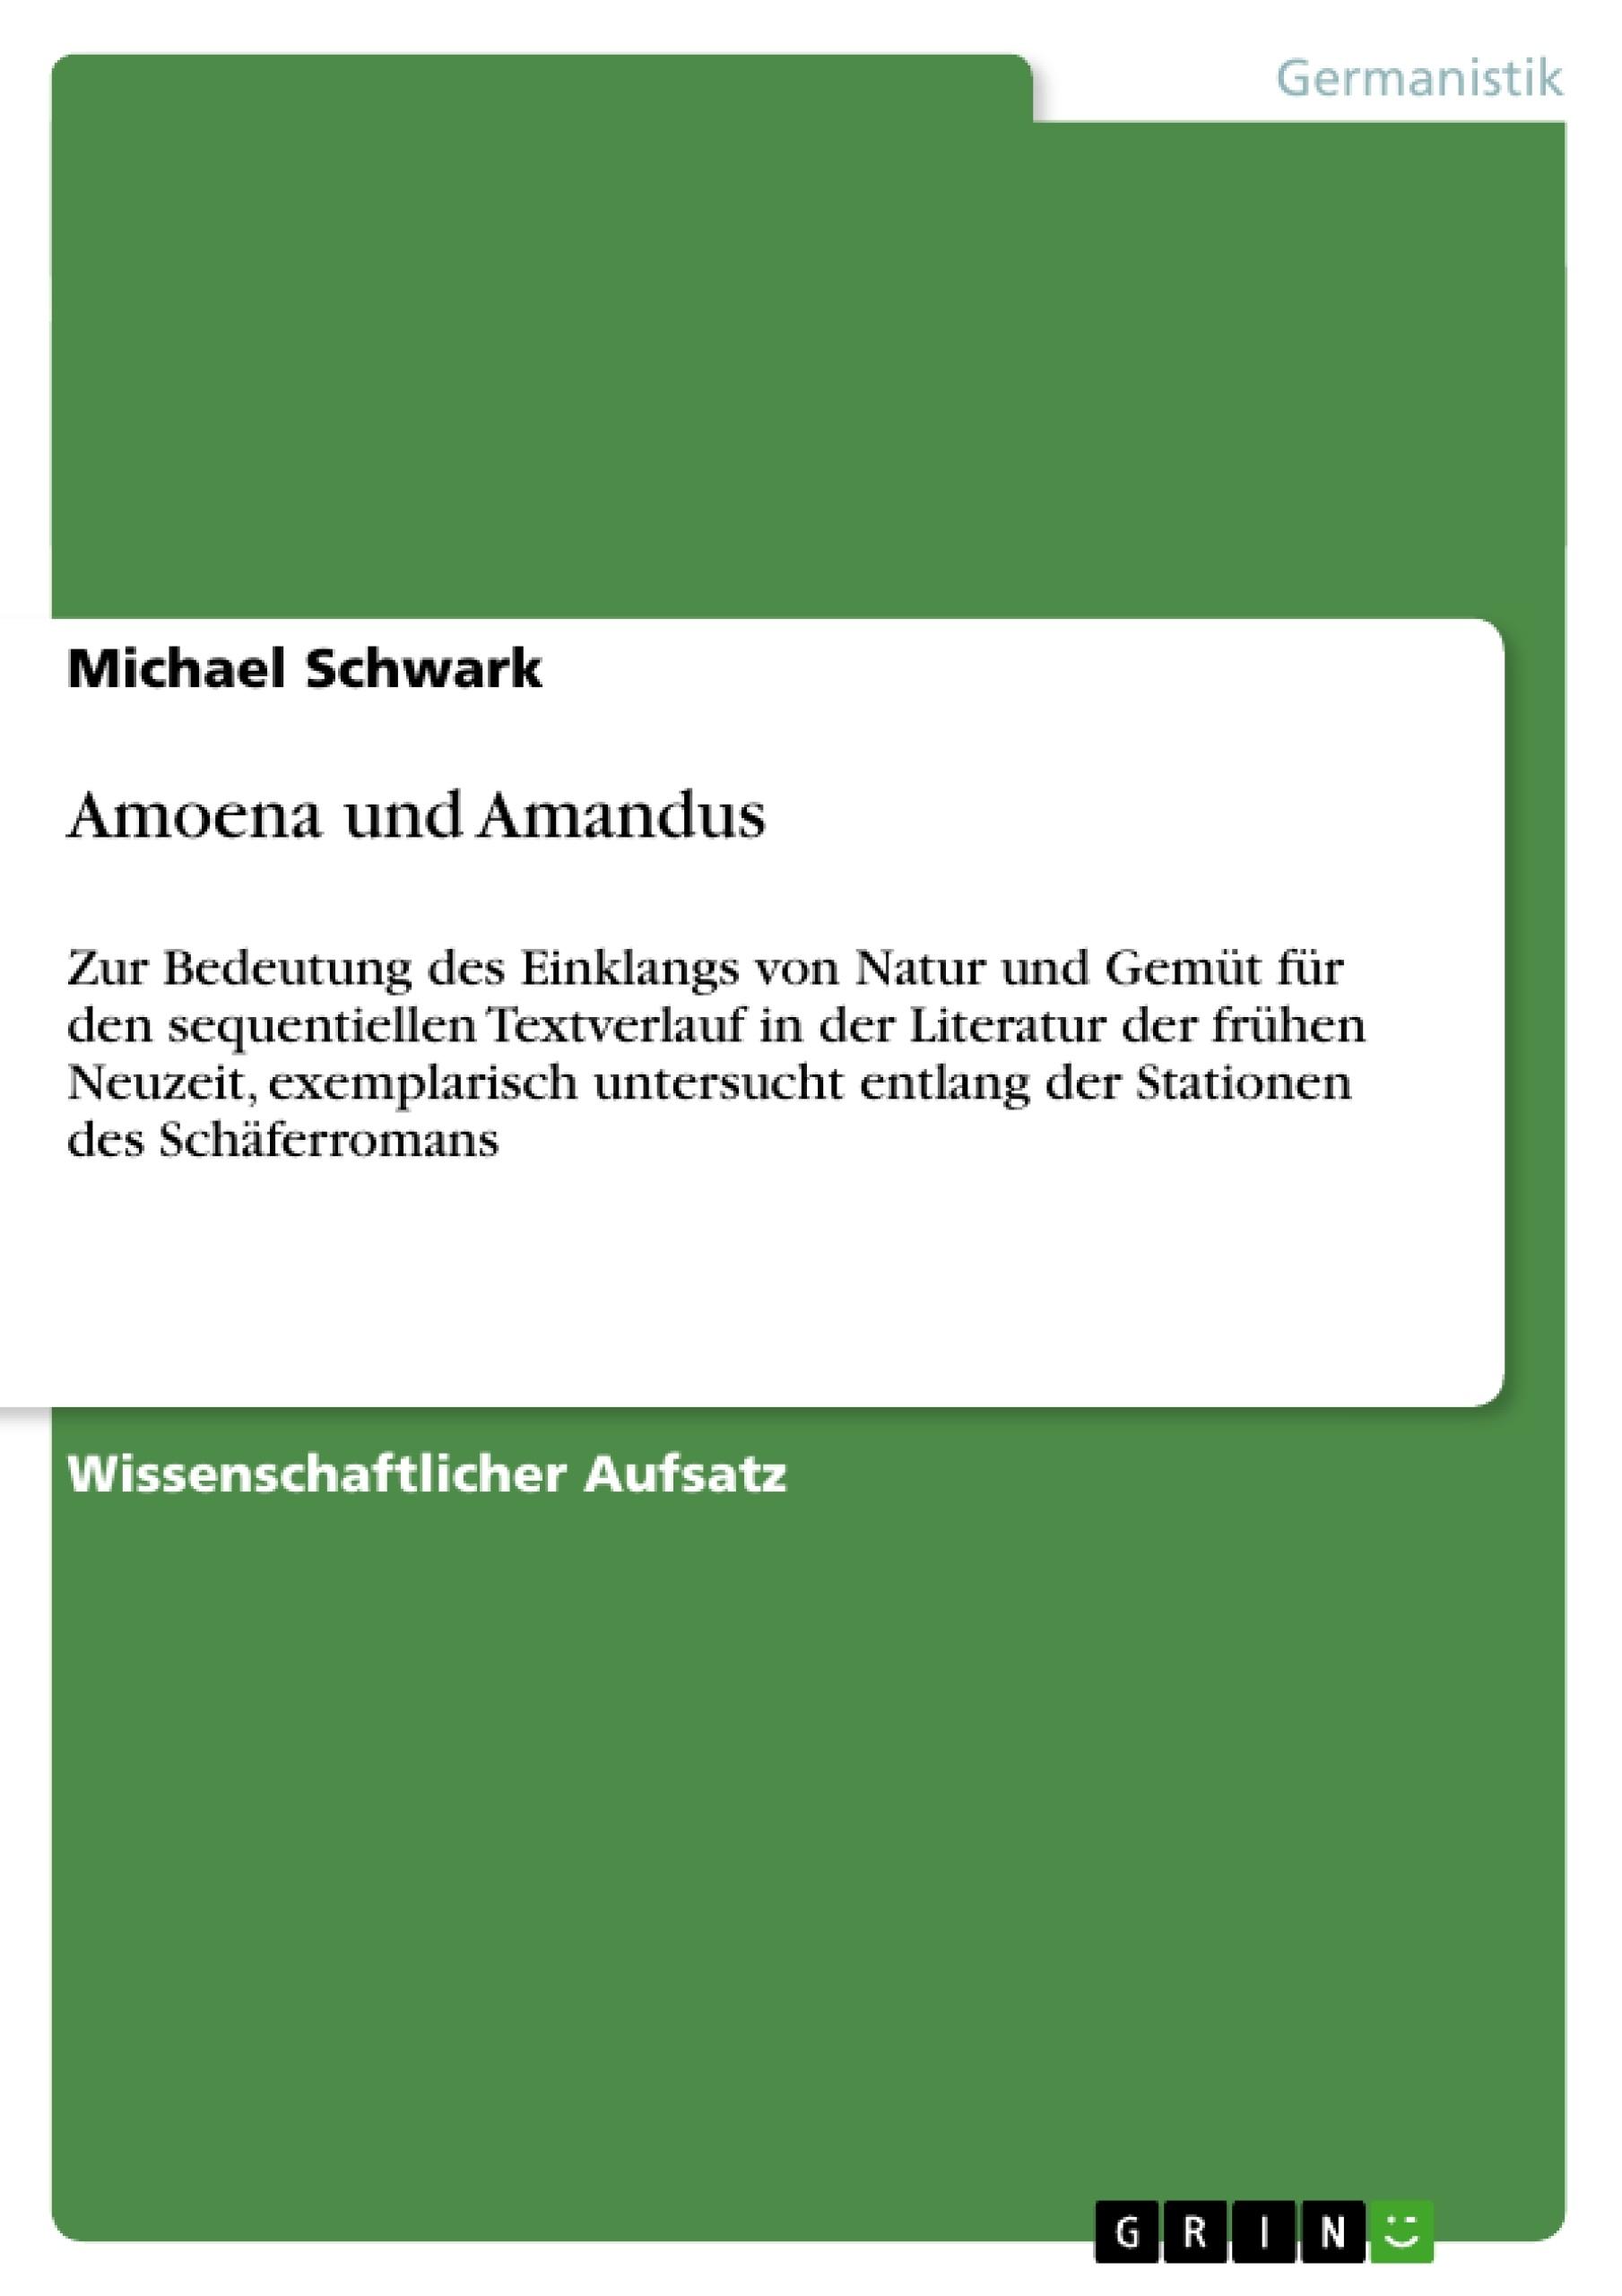 Titel: Amoena und Amandus